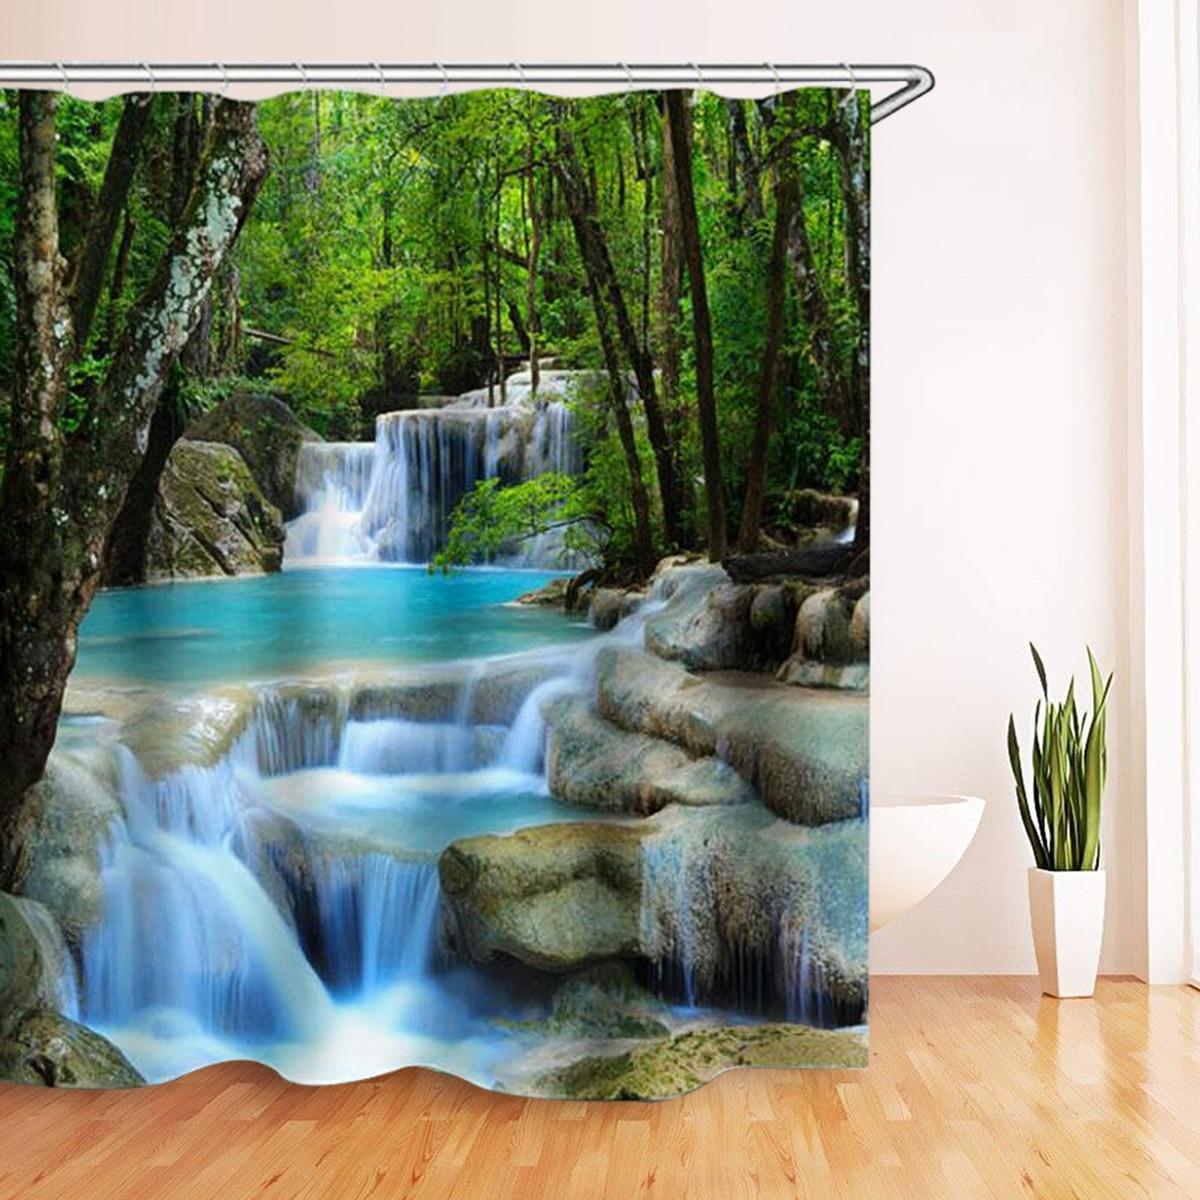 3D Waterfall Scenery Waterproof Shower Curtain Bathroom  Landscape Trees Flower Bath Mat Set Pedestal Rug Lid Toilet Cover